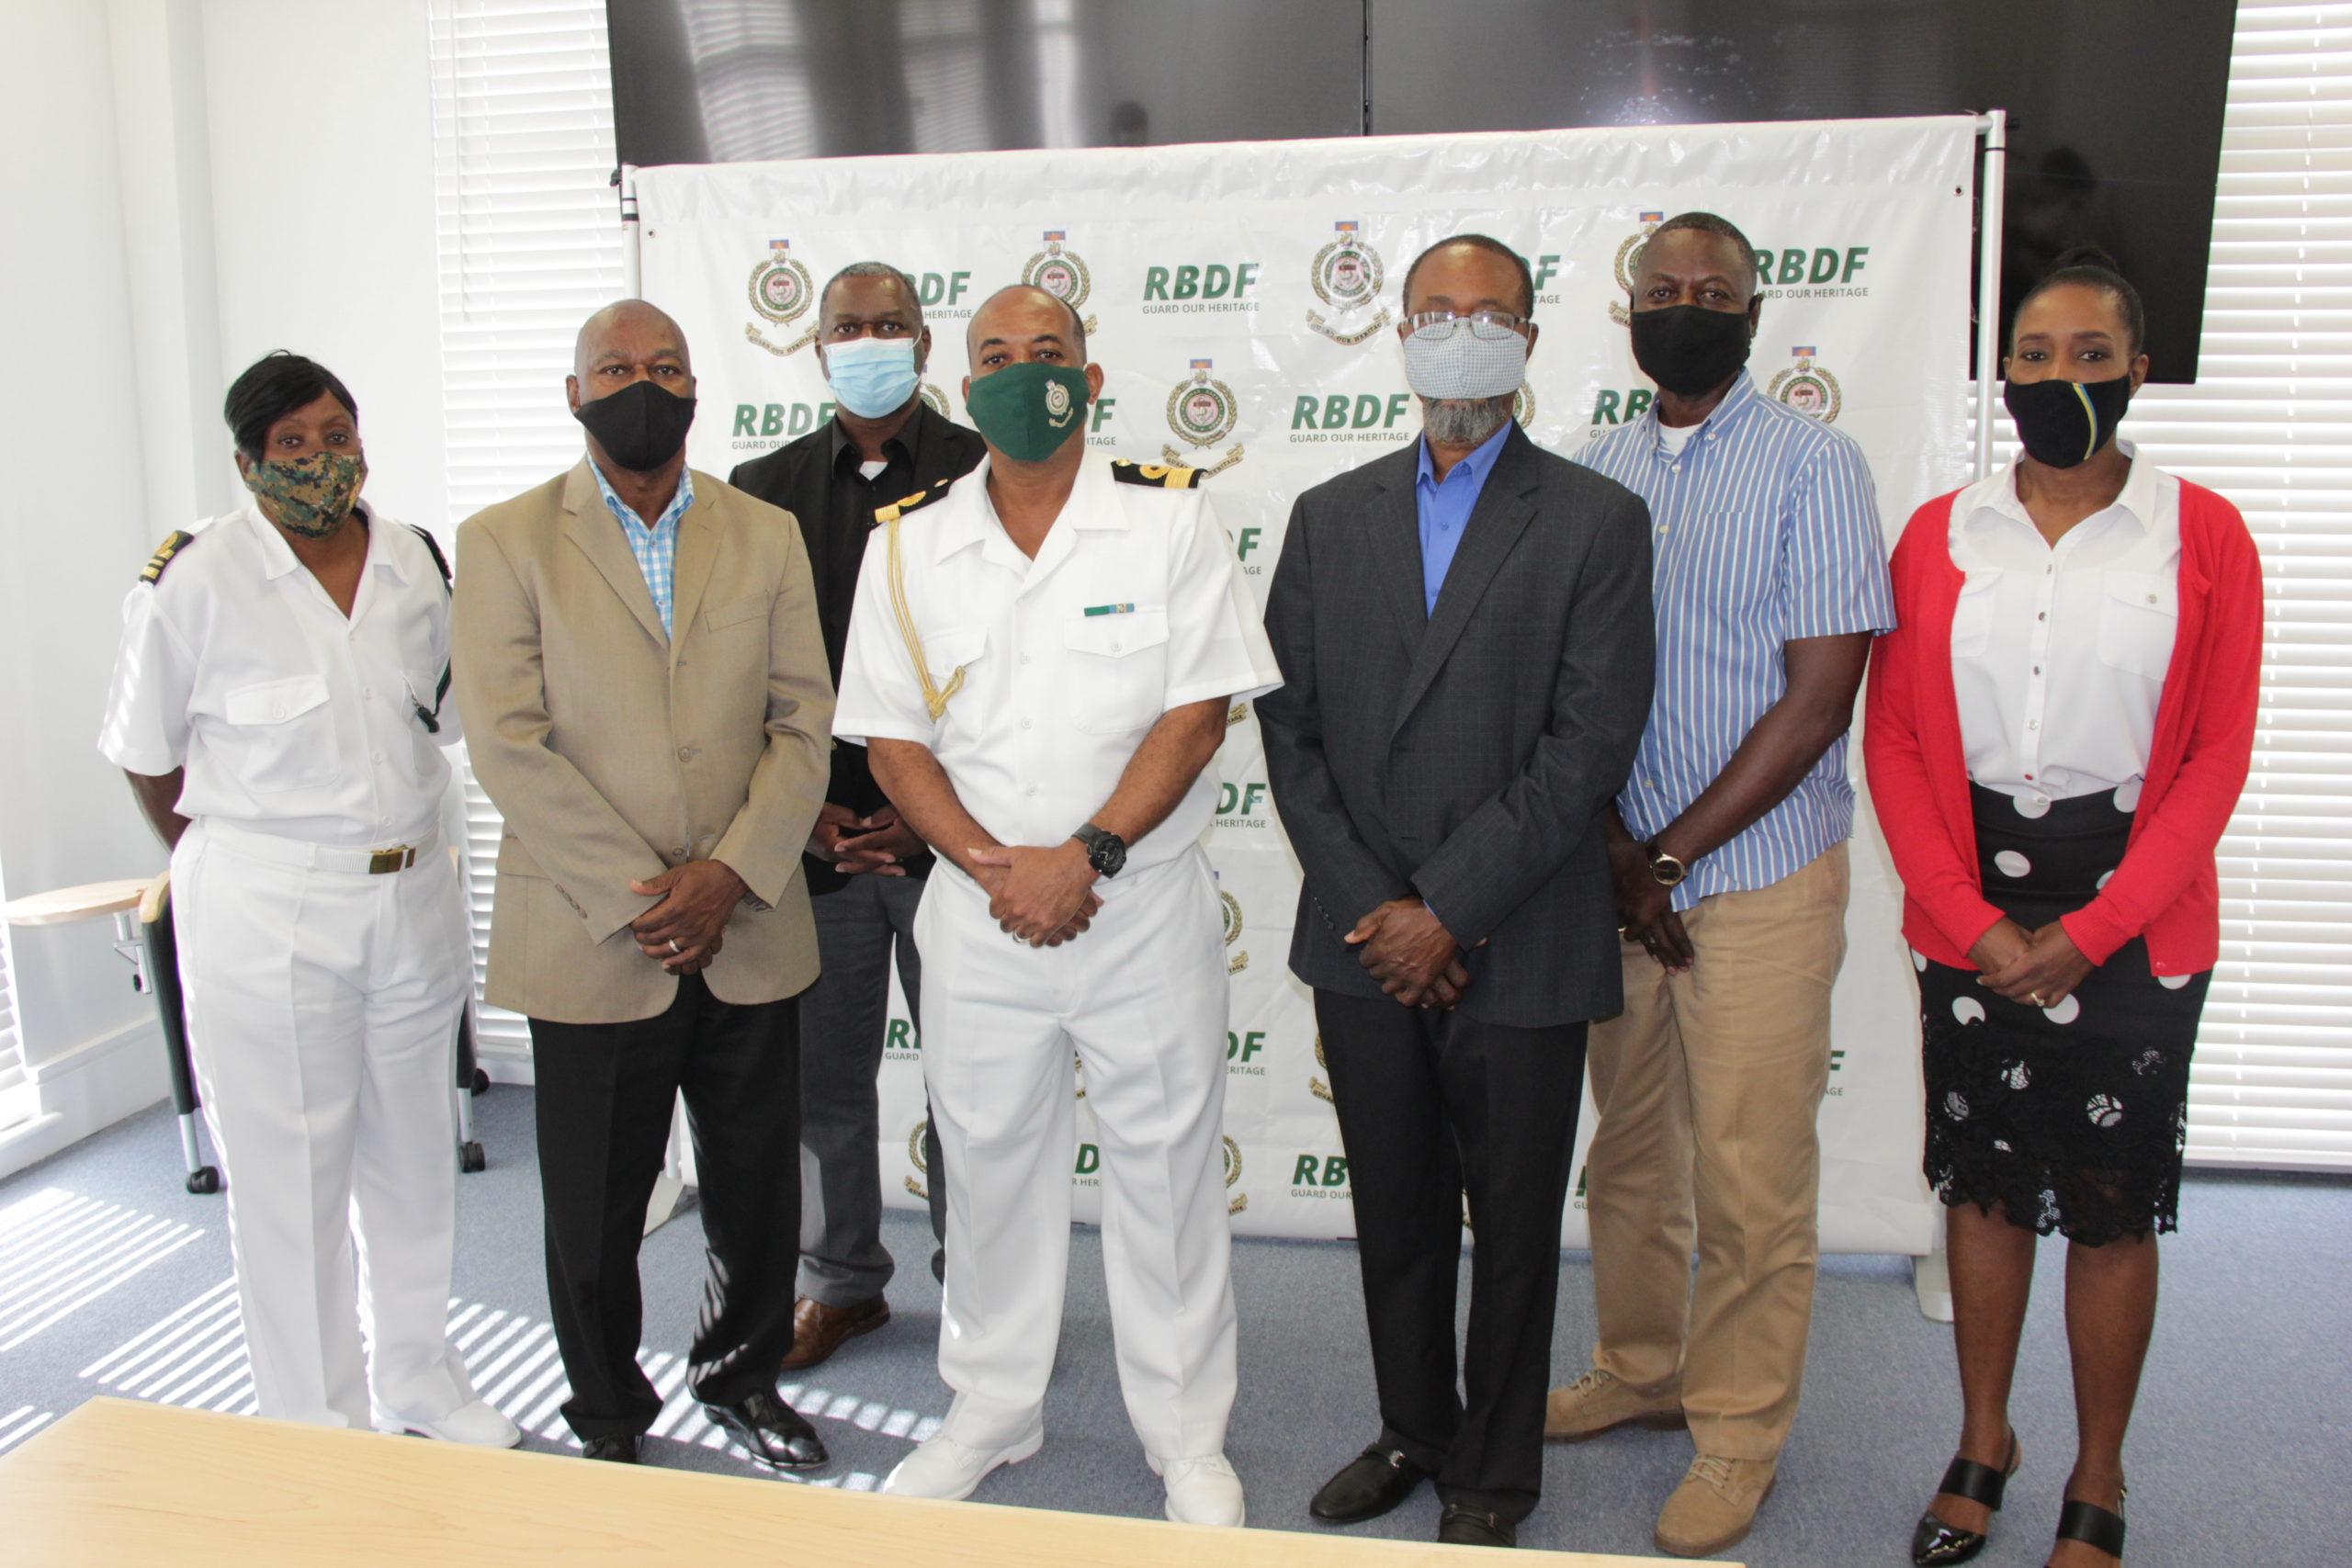 RBDF commander meets with community associations